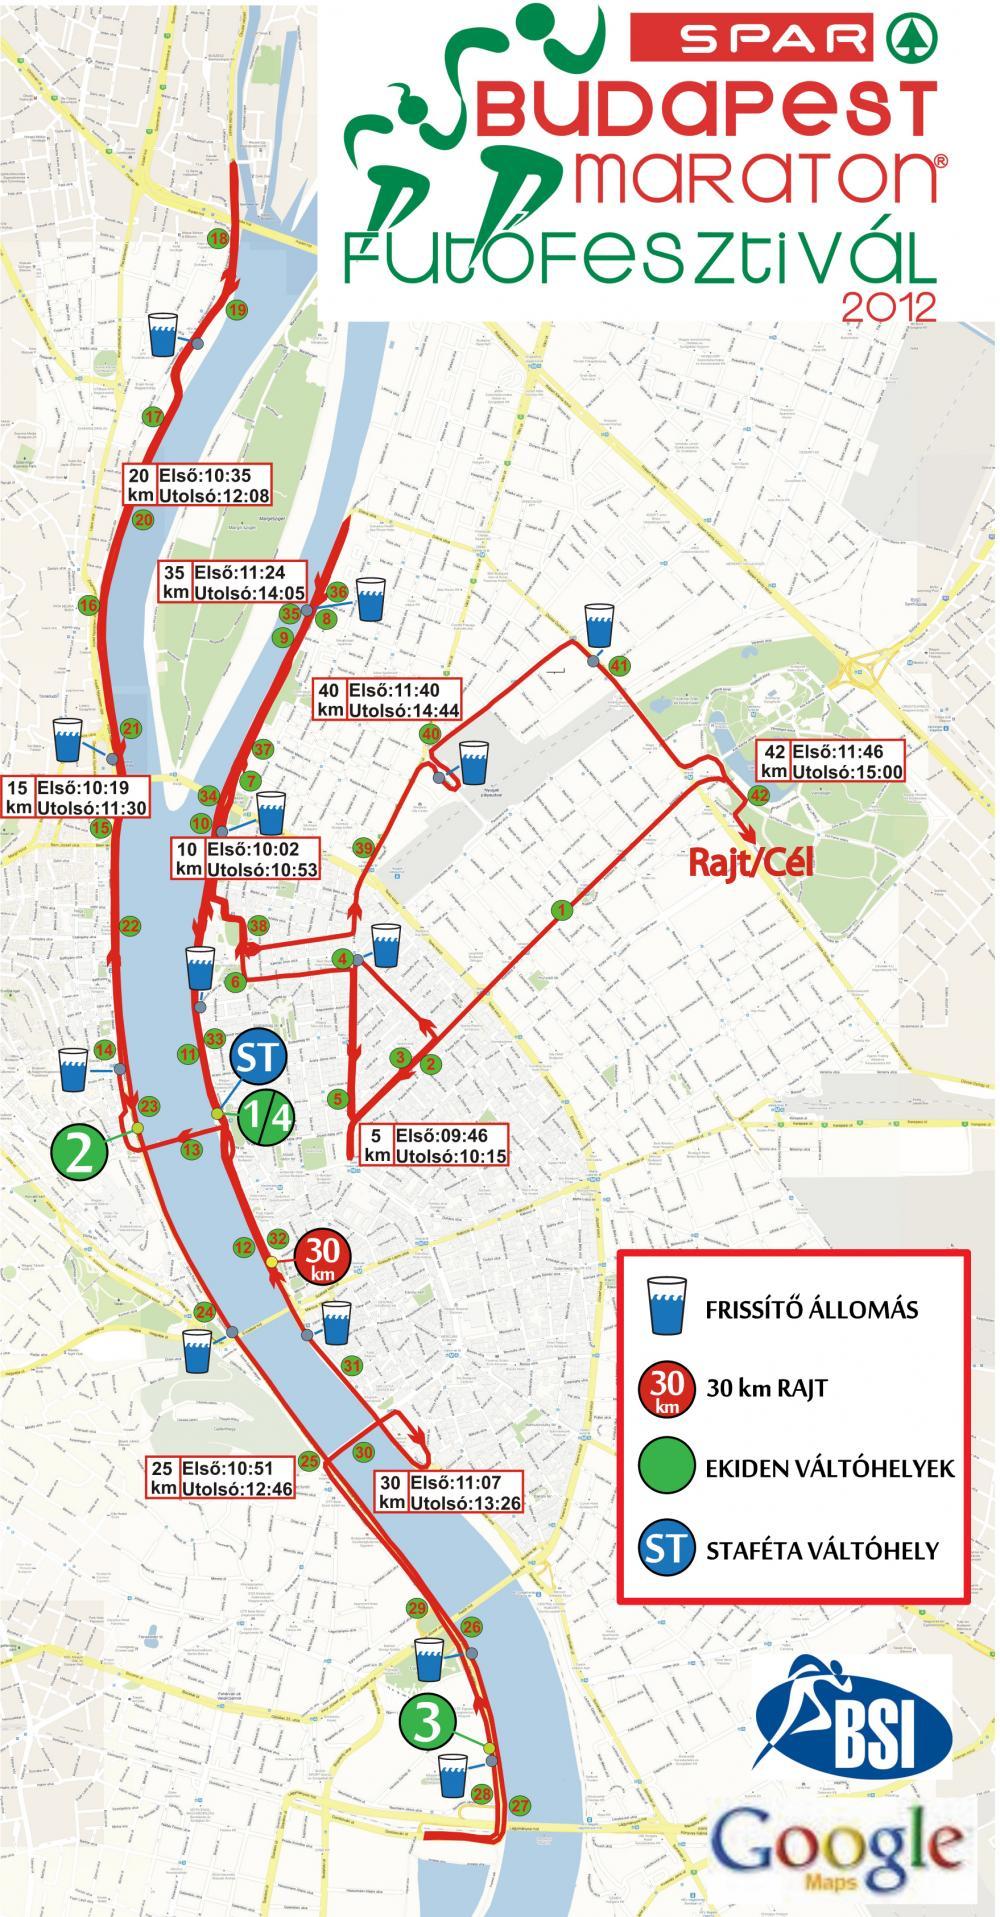 budapest térkép távolság 27. Spar Budapest Maraton   térkép   Futanet.hu budapest térkép távolság